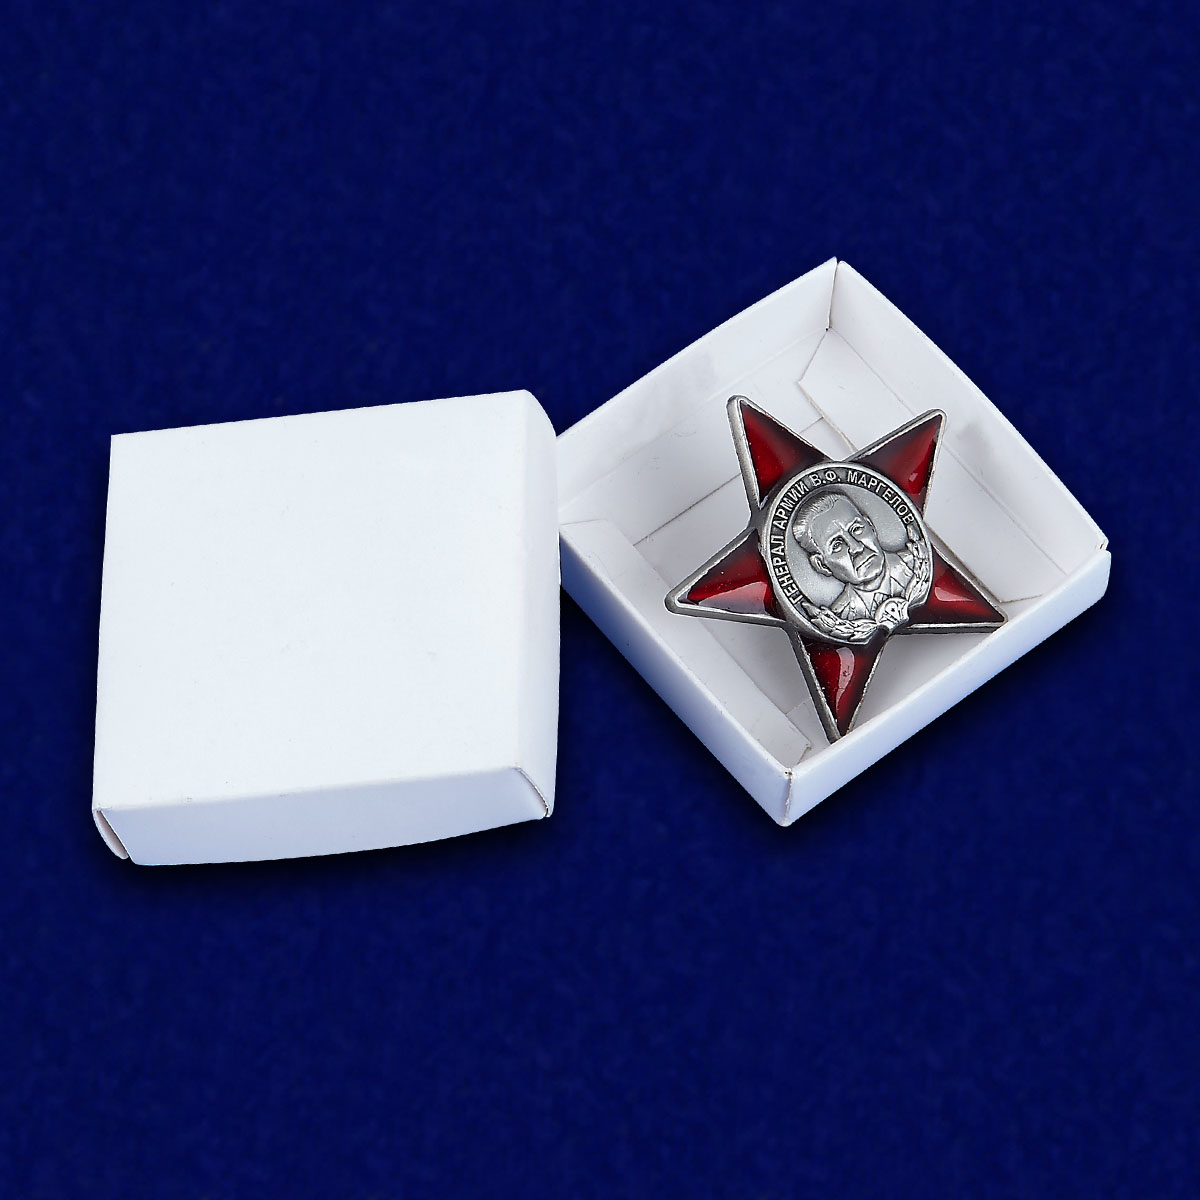 Орден Маргелова - в футляре